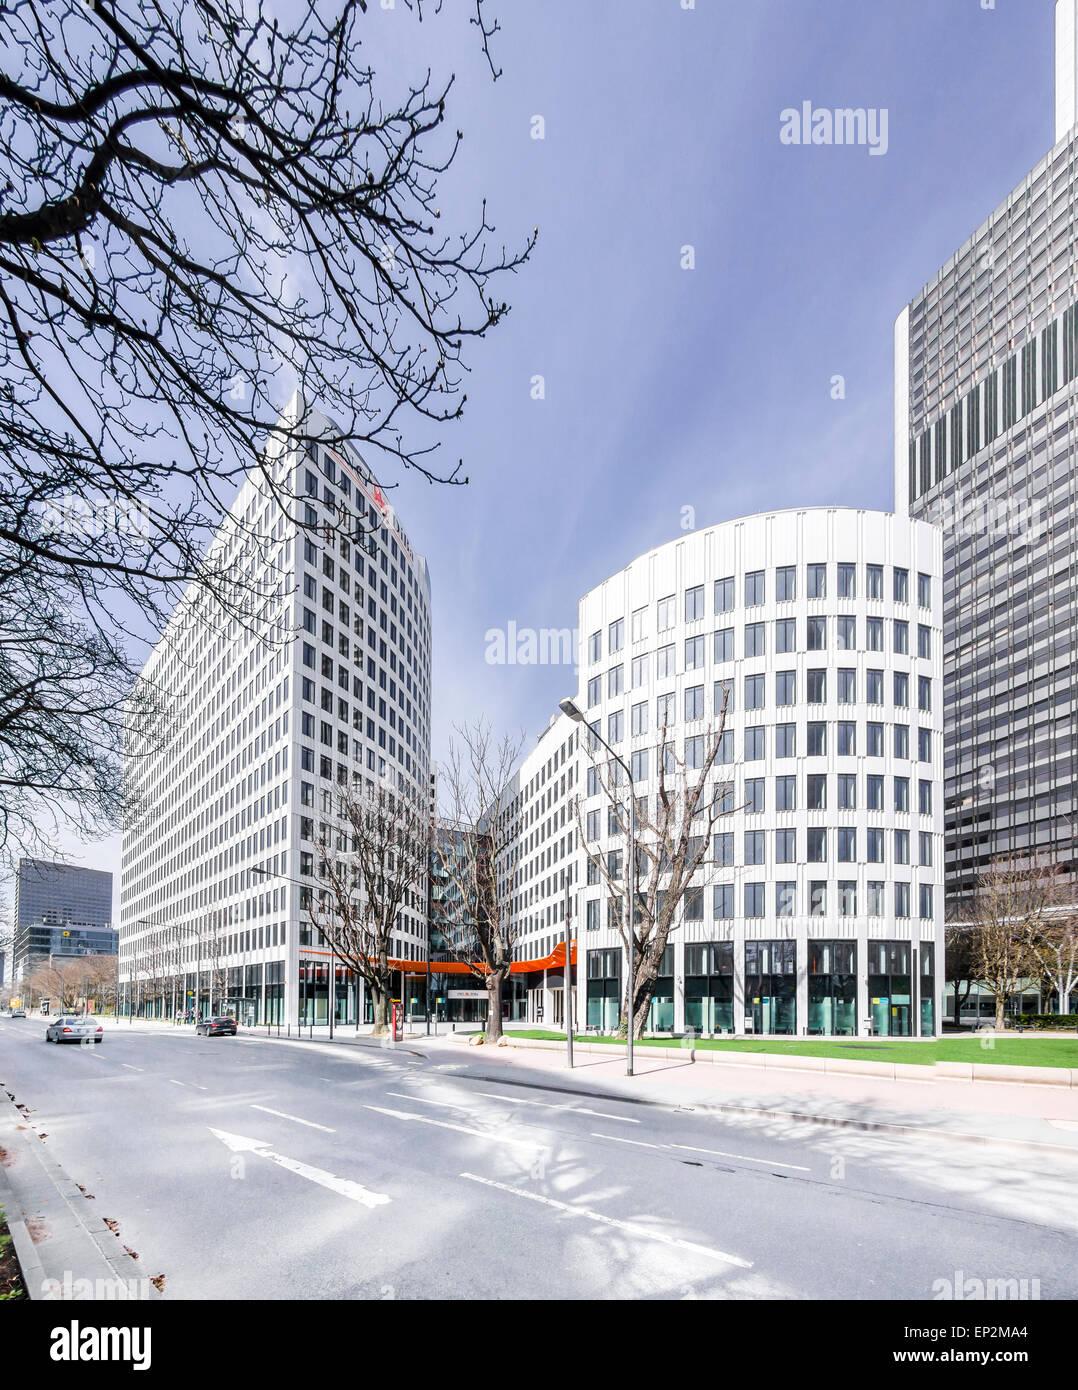 Germany, Frankfurt, headquarters building of ING DiBa - Stock Image